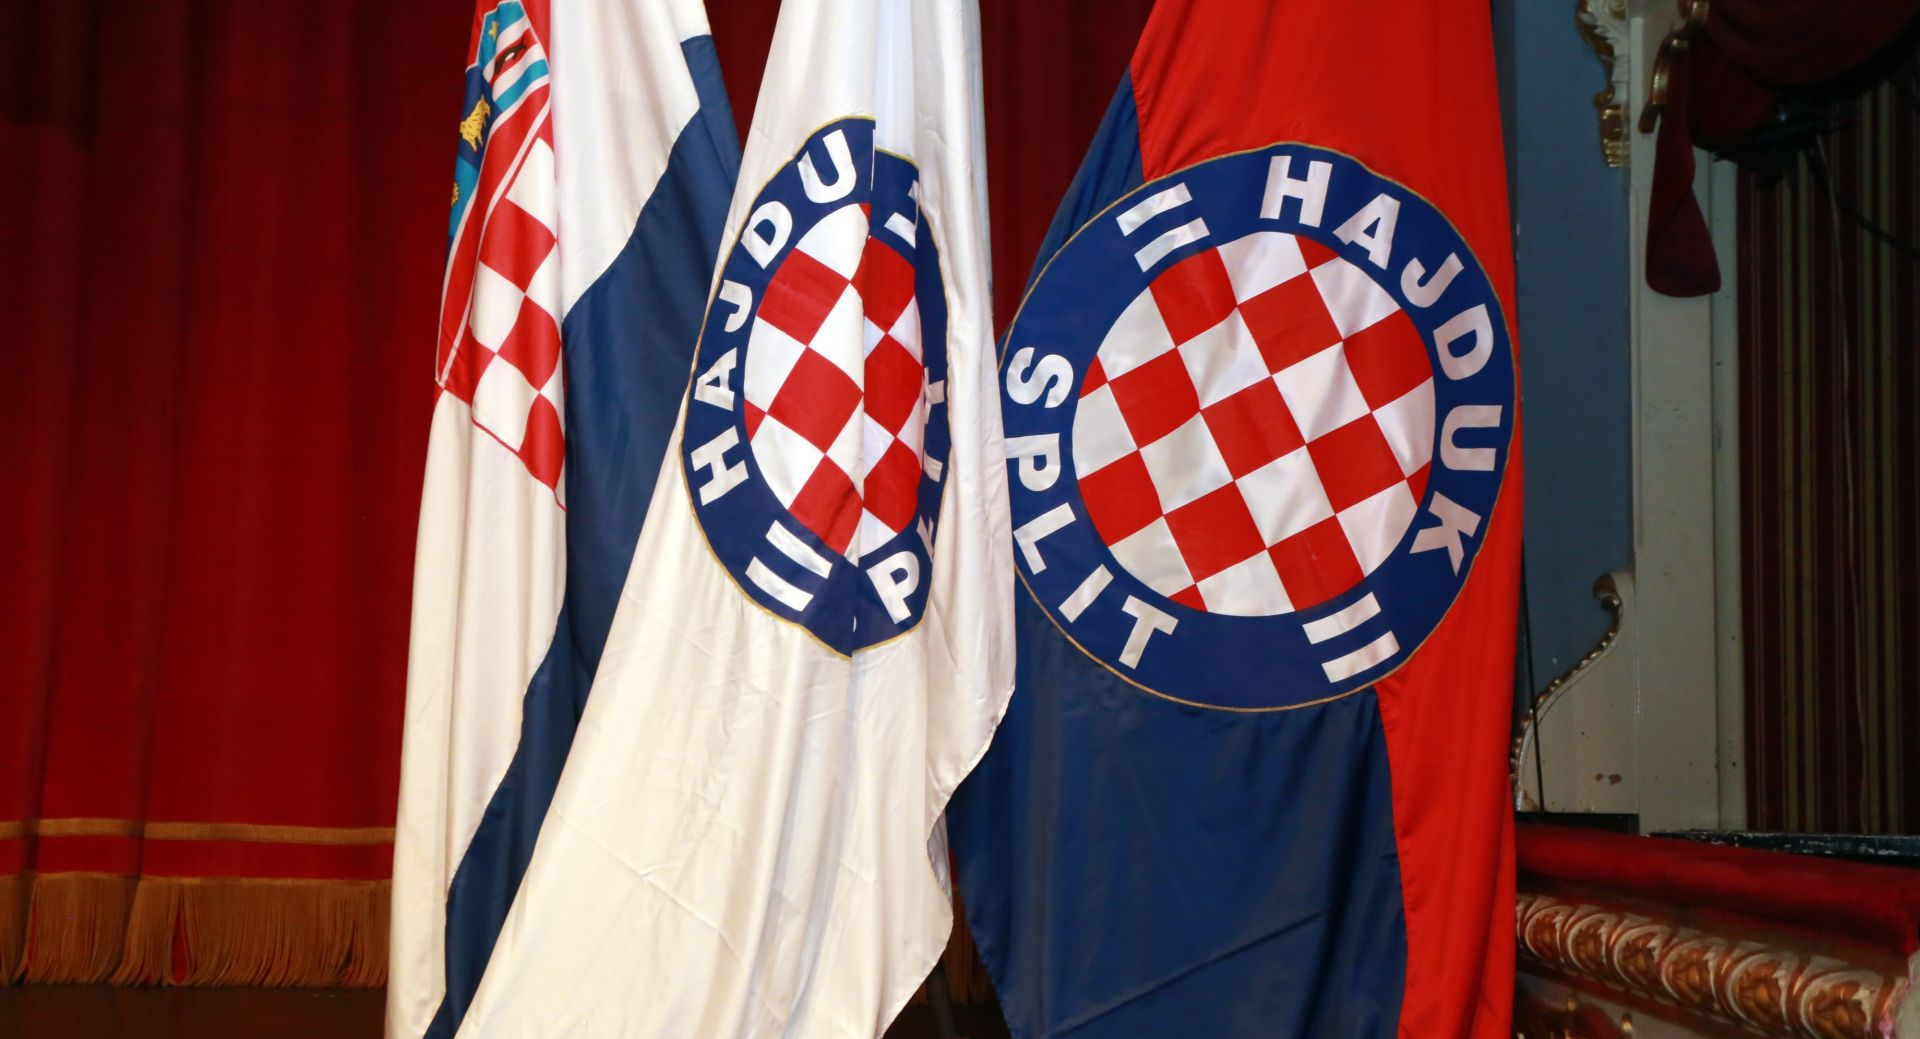 HNS osudio napad na DPH Zagreb